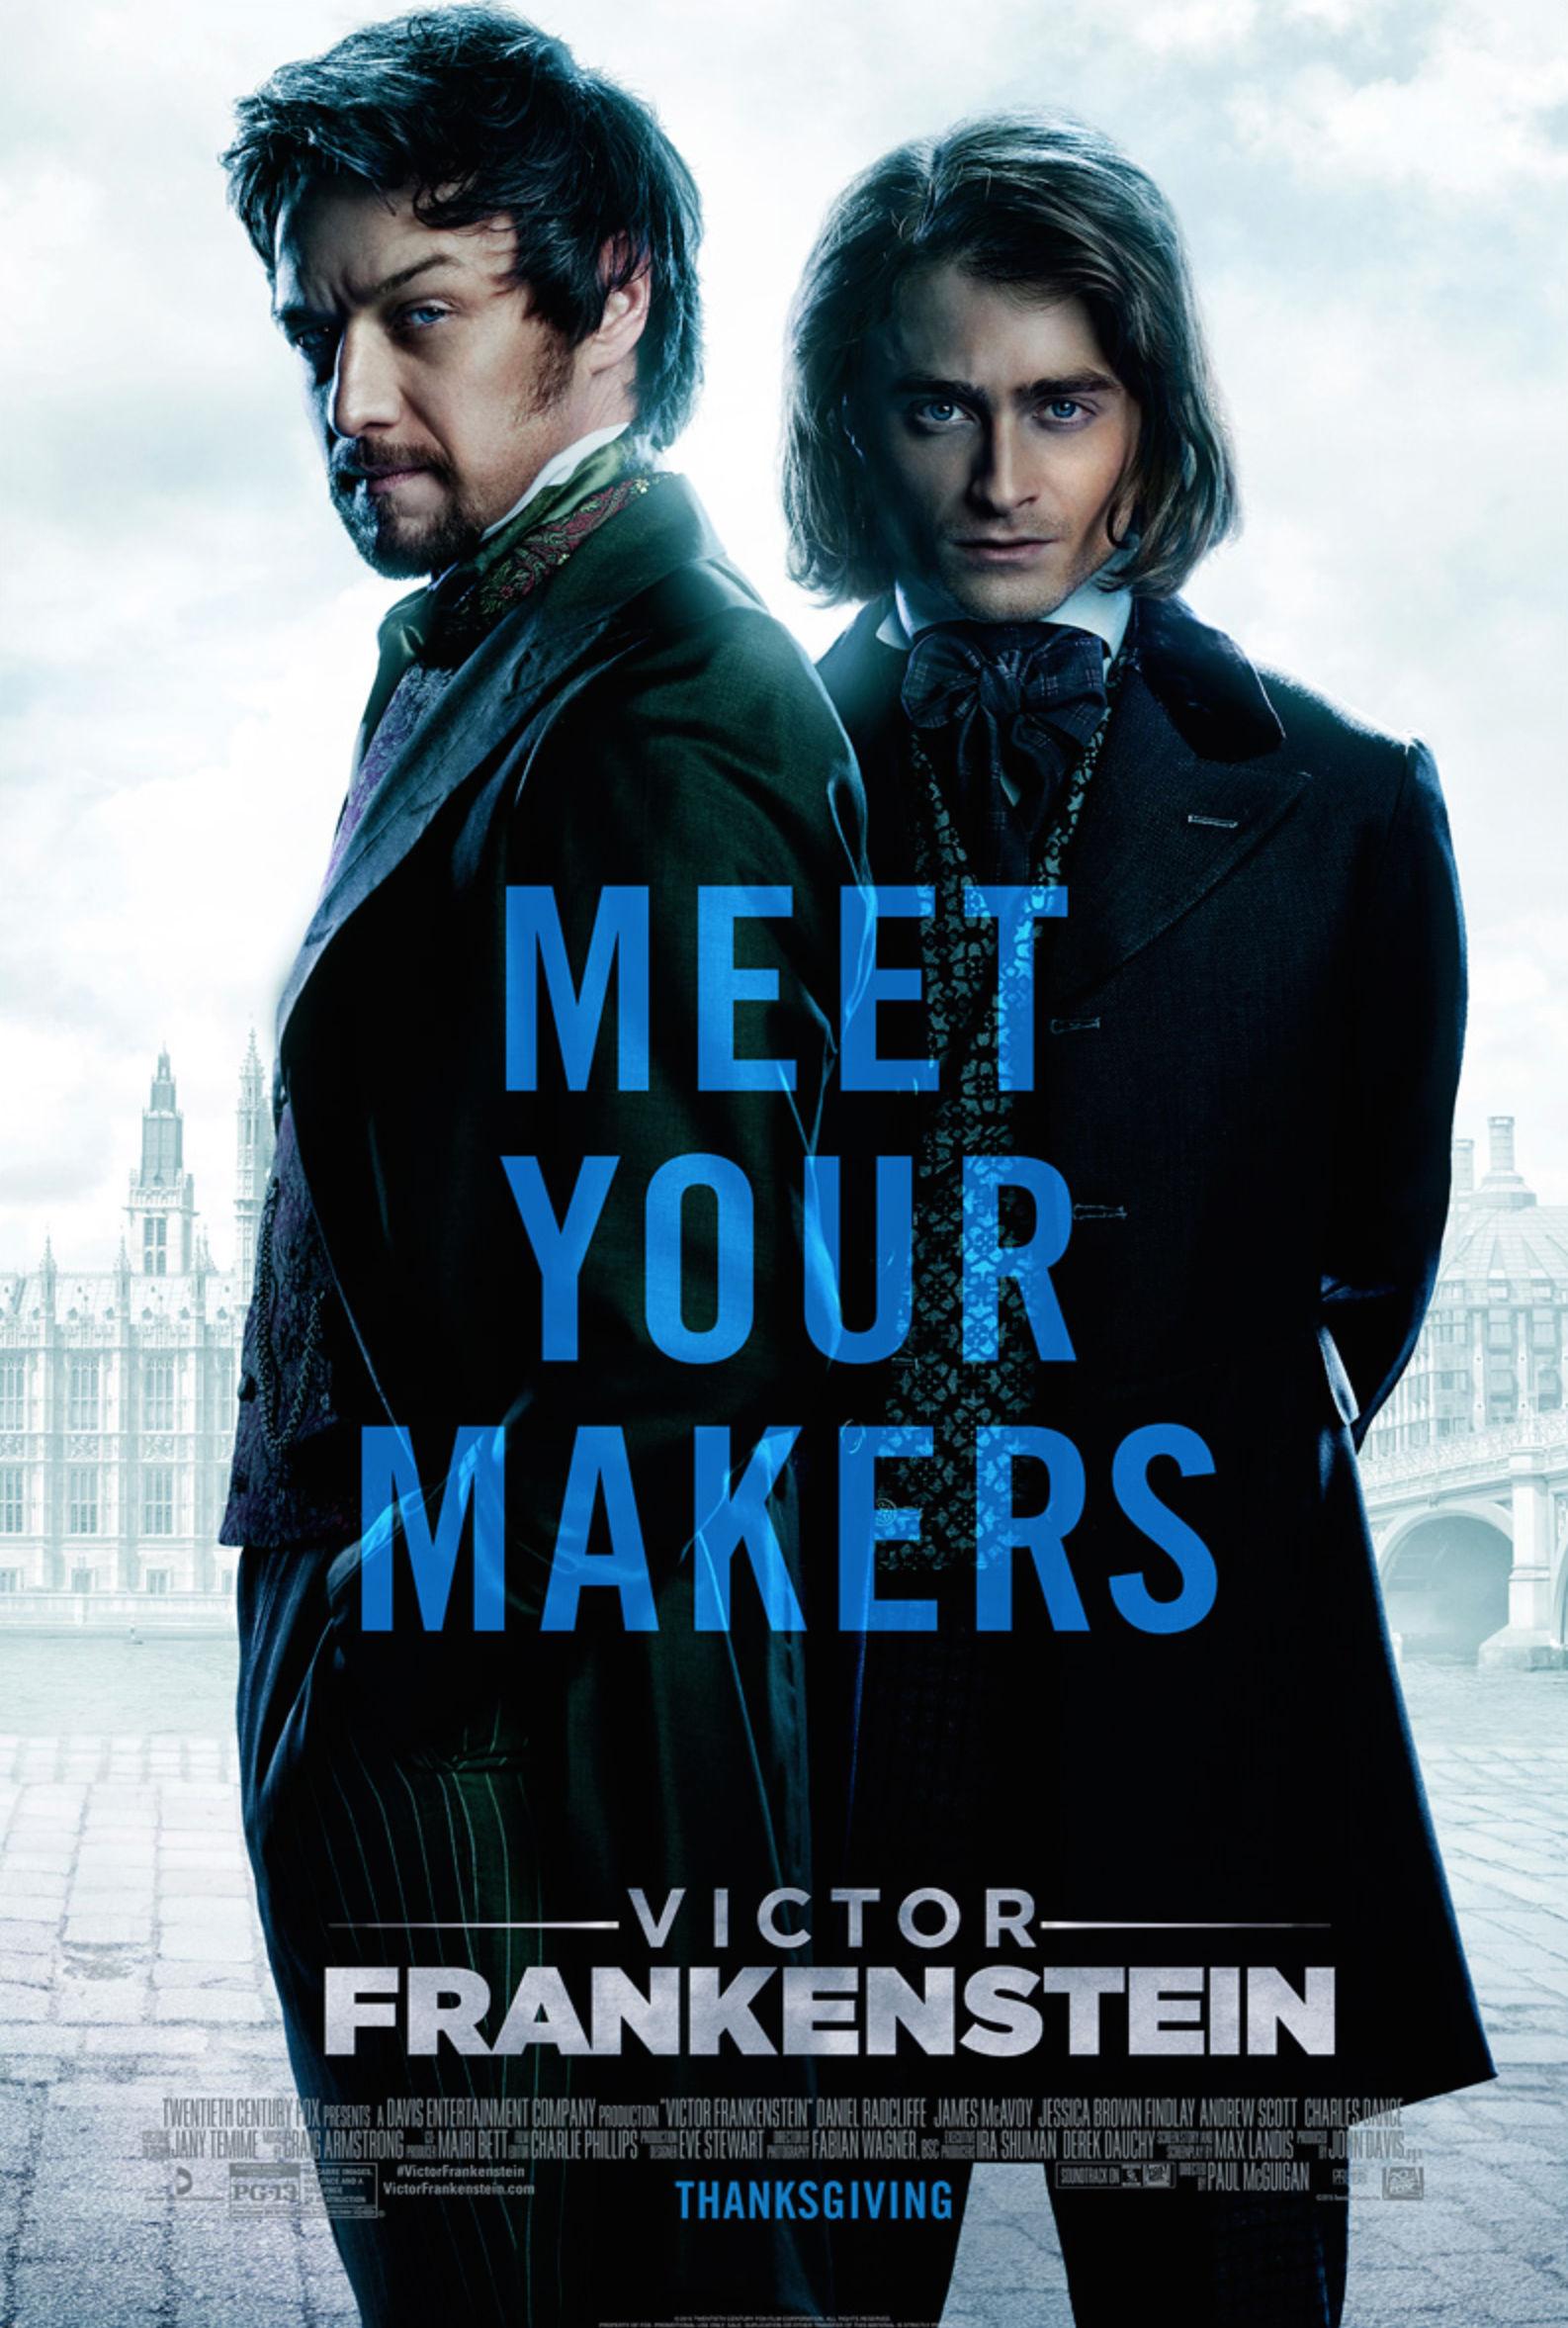 victor-frankenstein-2015-poster.jpg